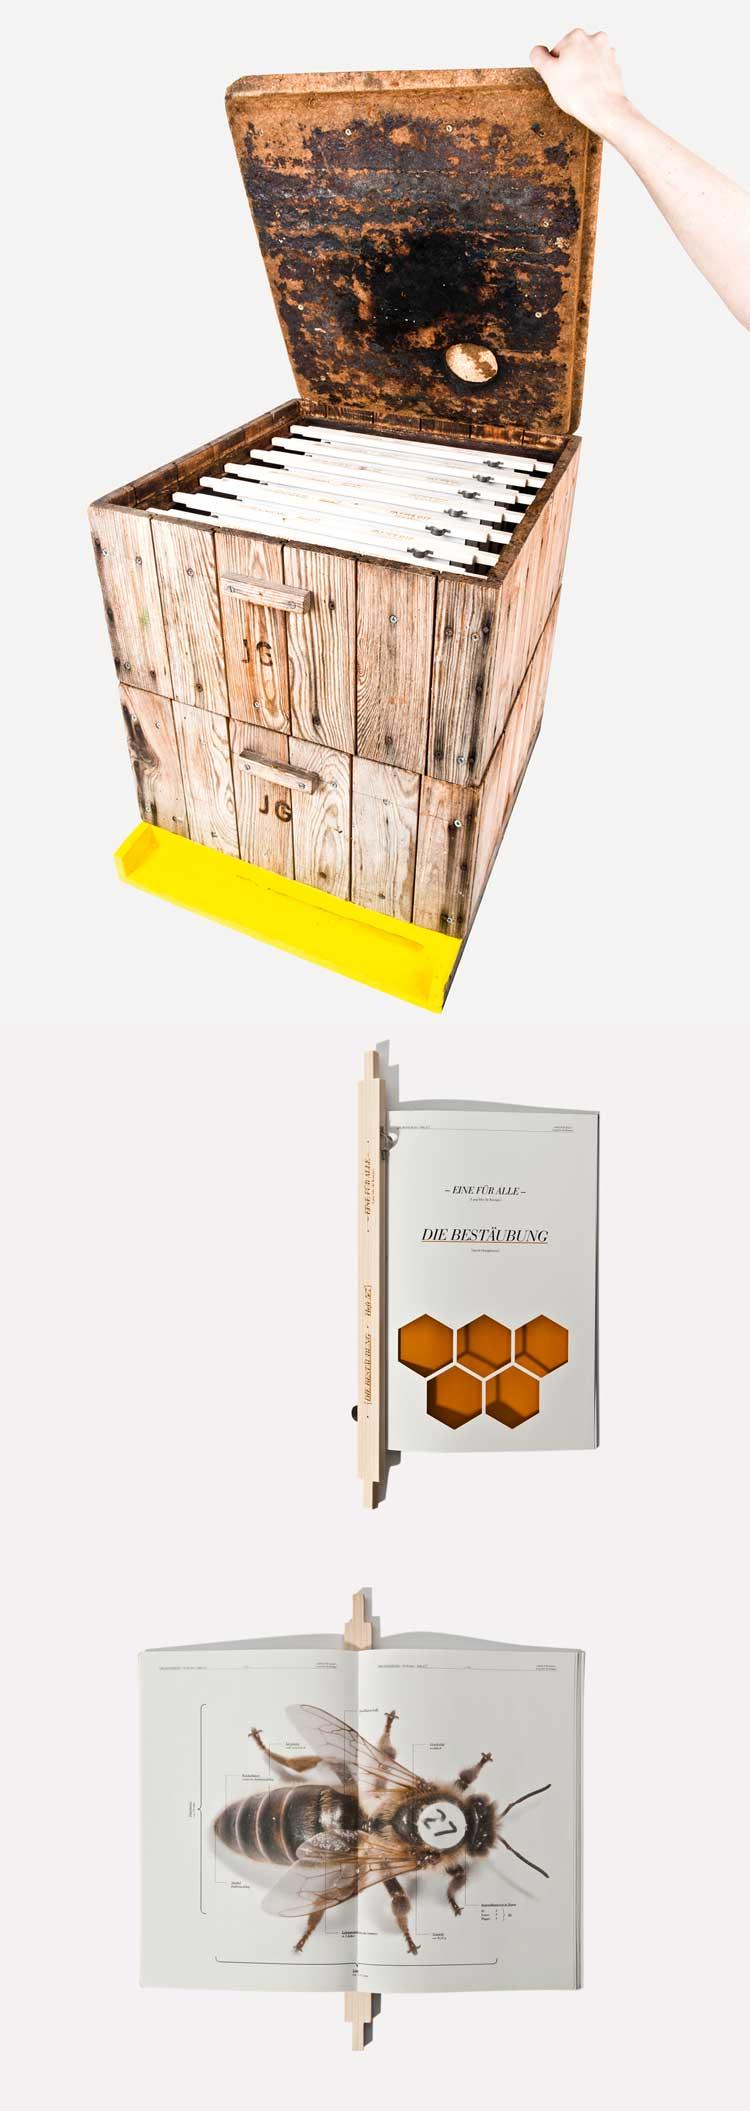 formati sperimentali honey project